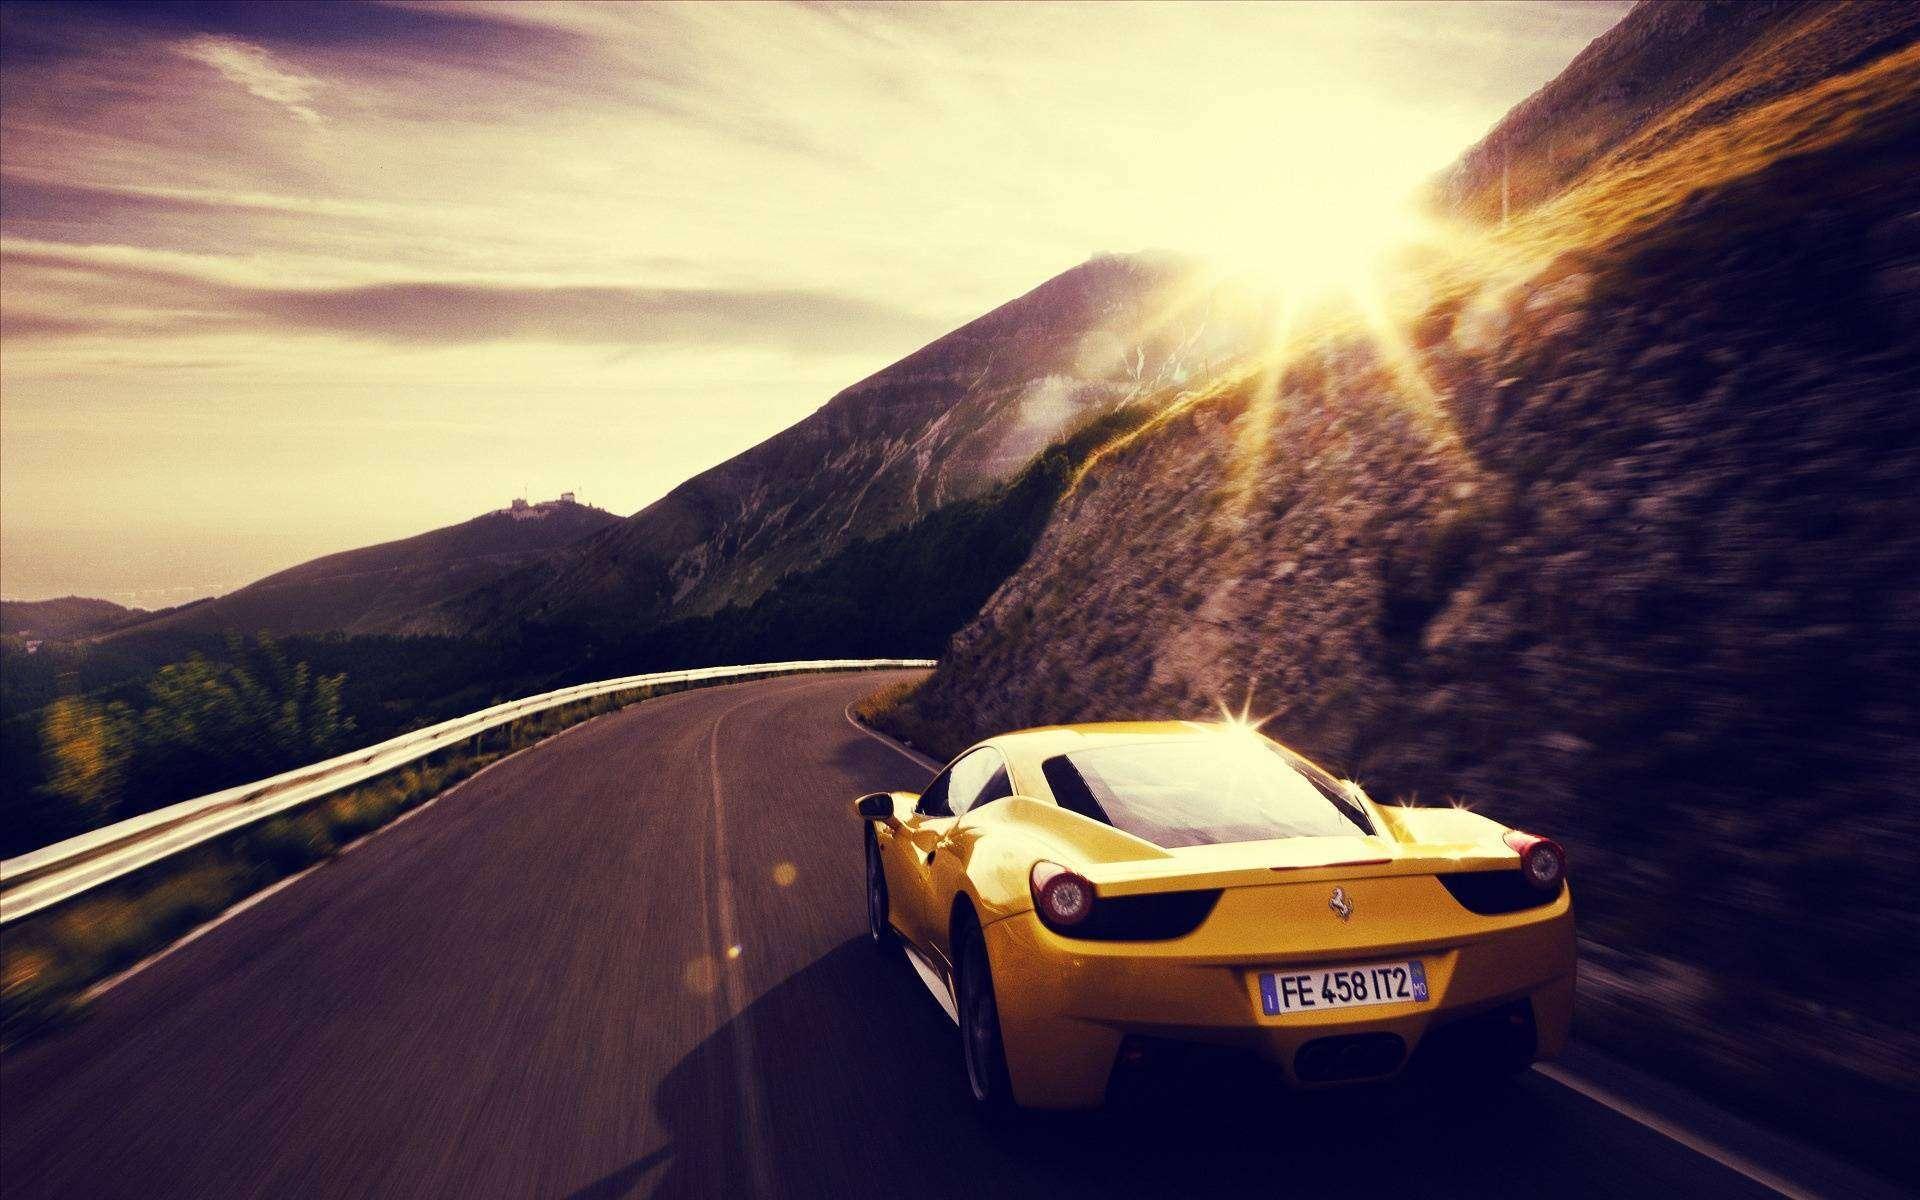 Yellow Ferrari Wallpaper 36223 1920x1200px